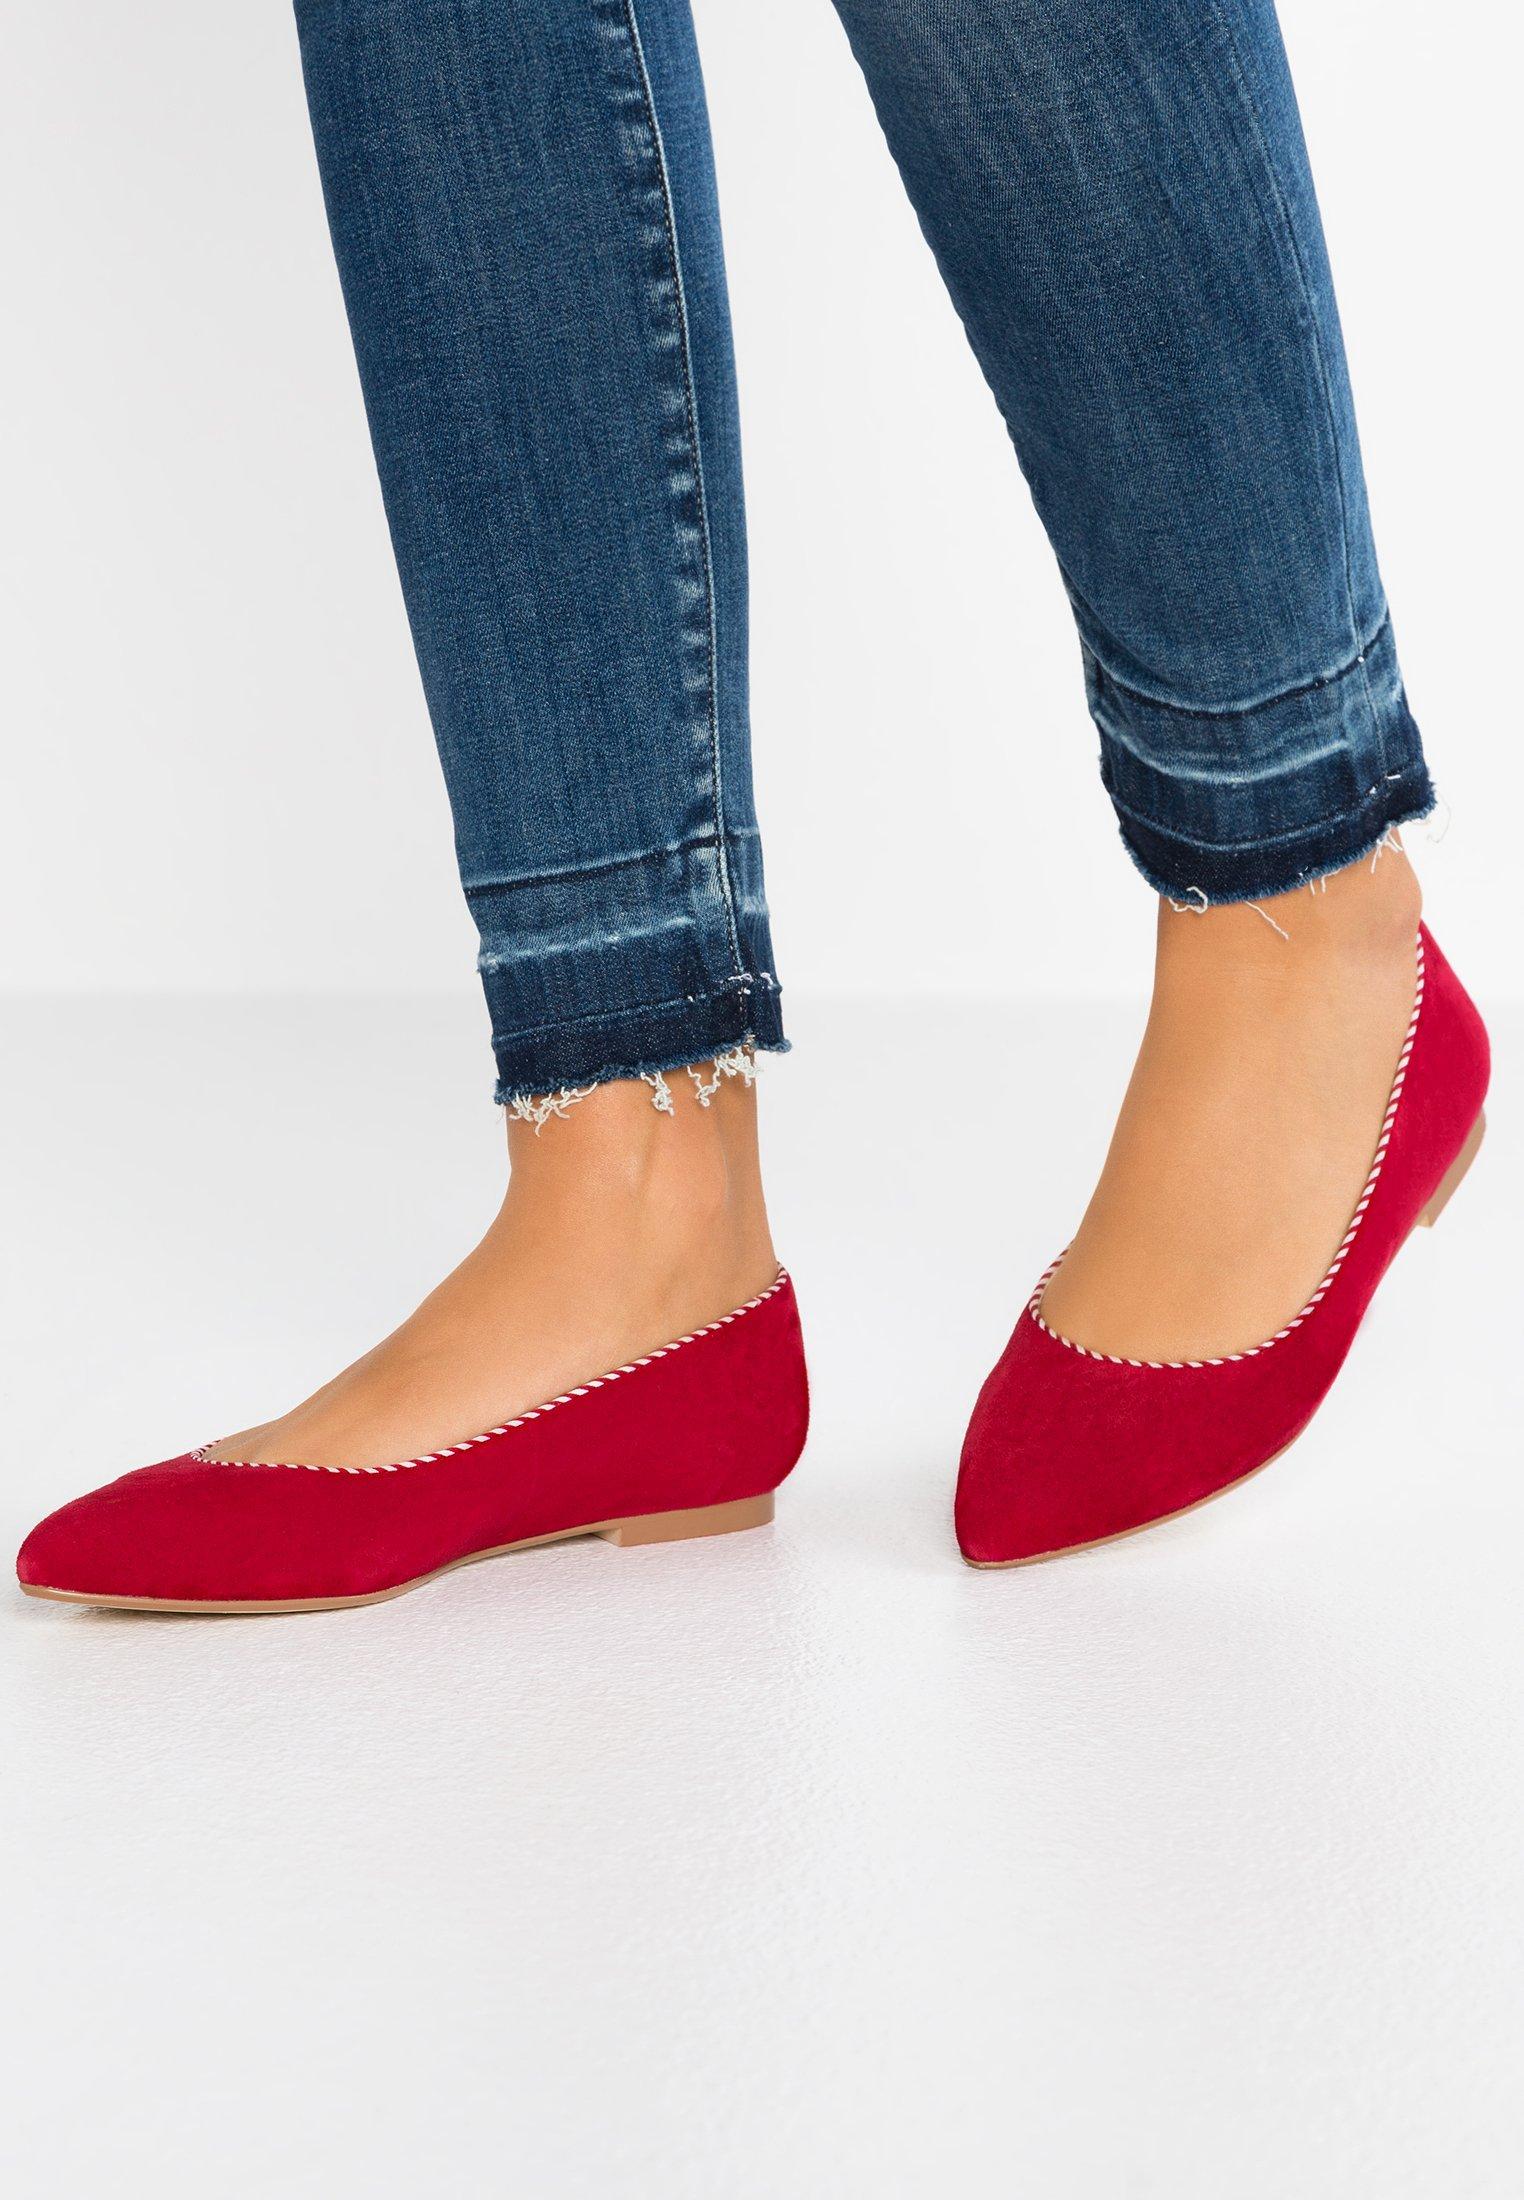 mint&berry - Ballet pumps - red